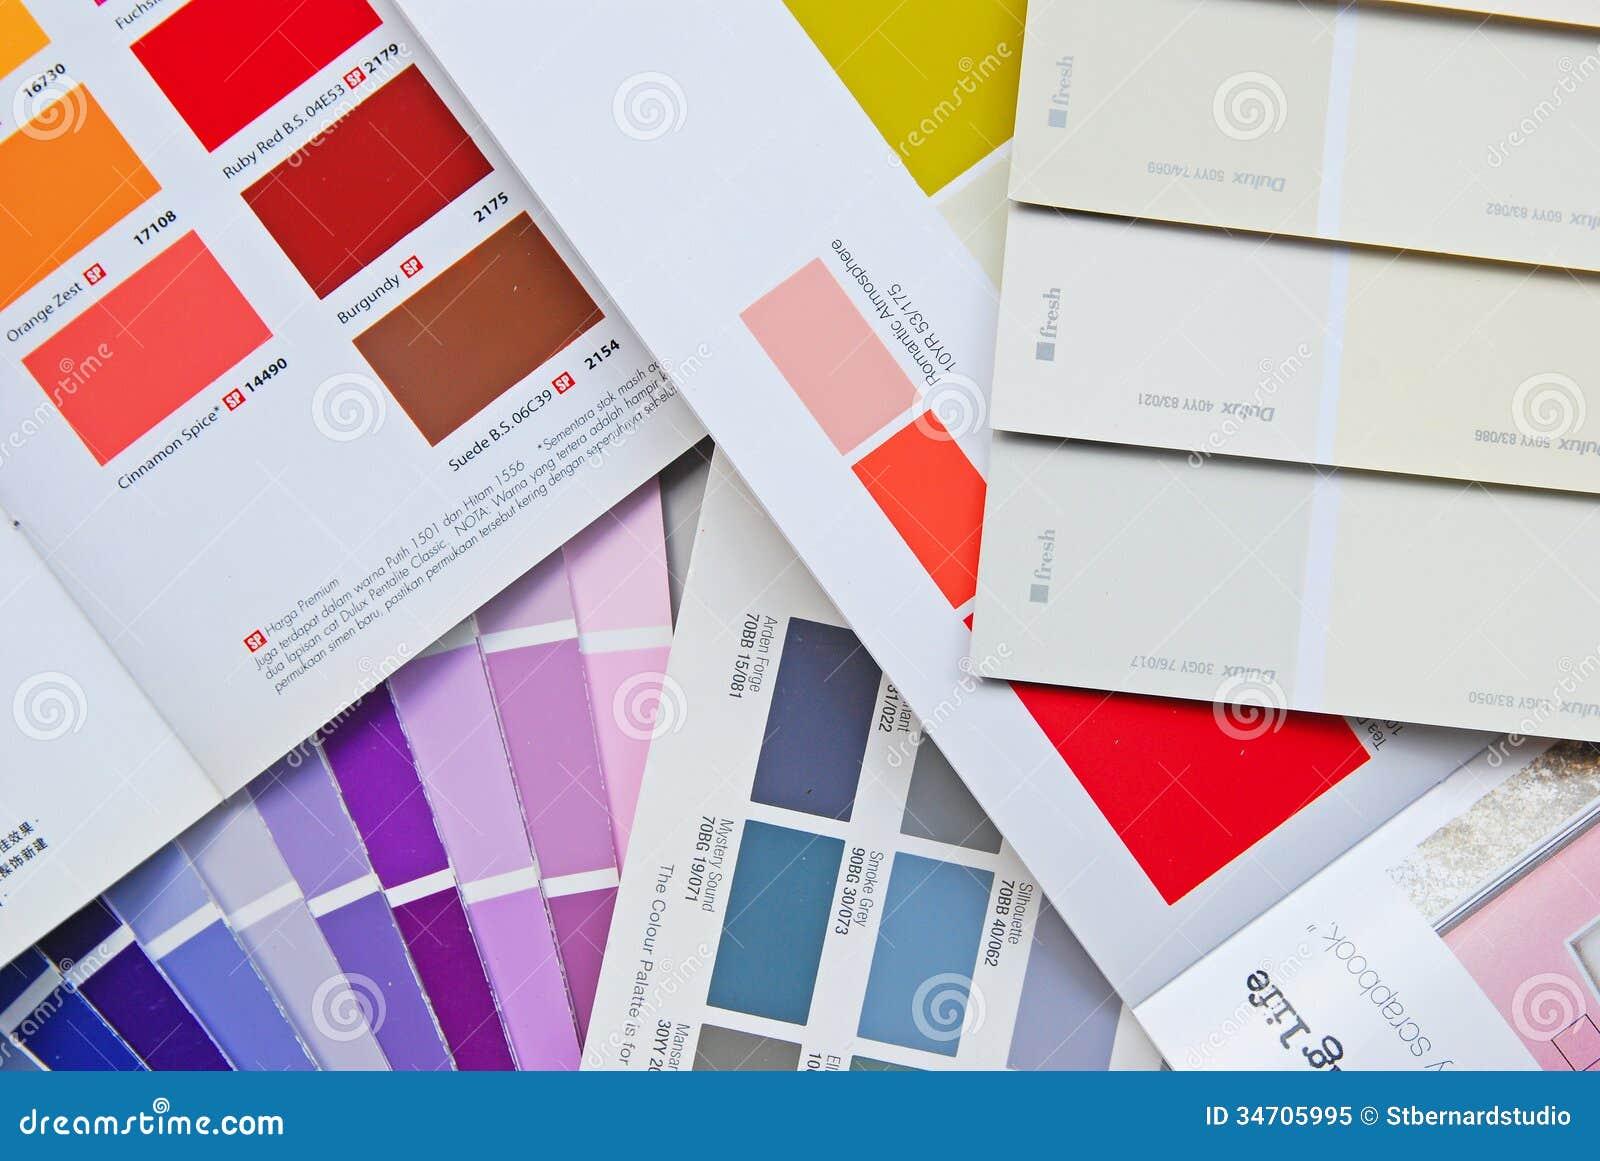 Catalogue couleur peinture colorado id e - Catalogue couleur peinture astral ...